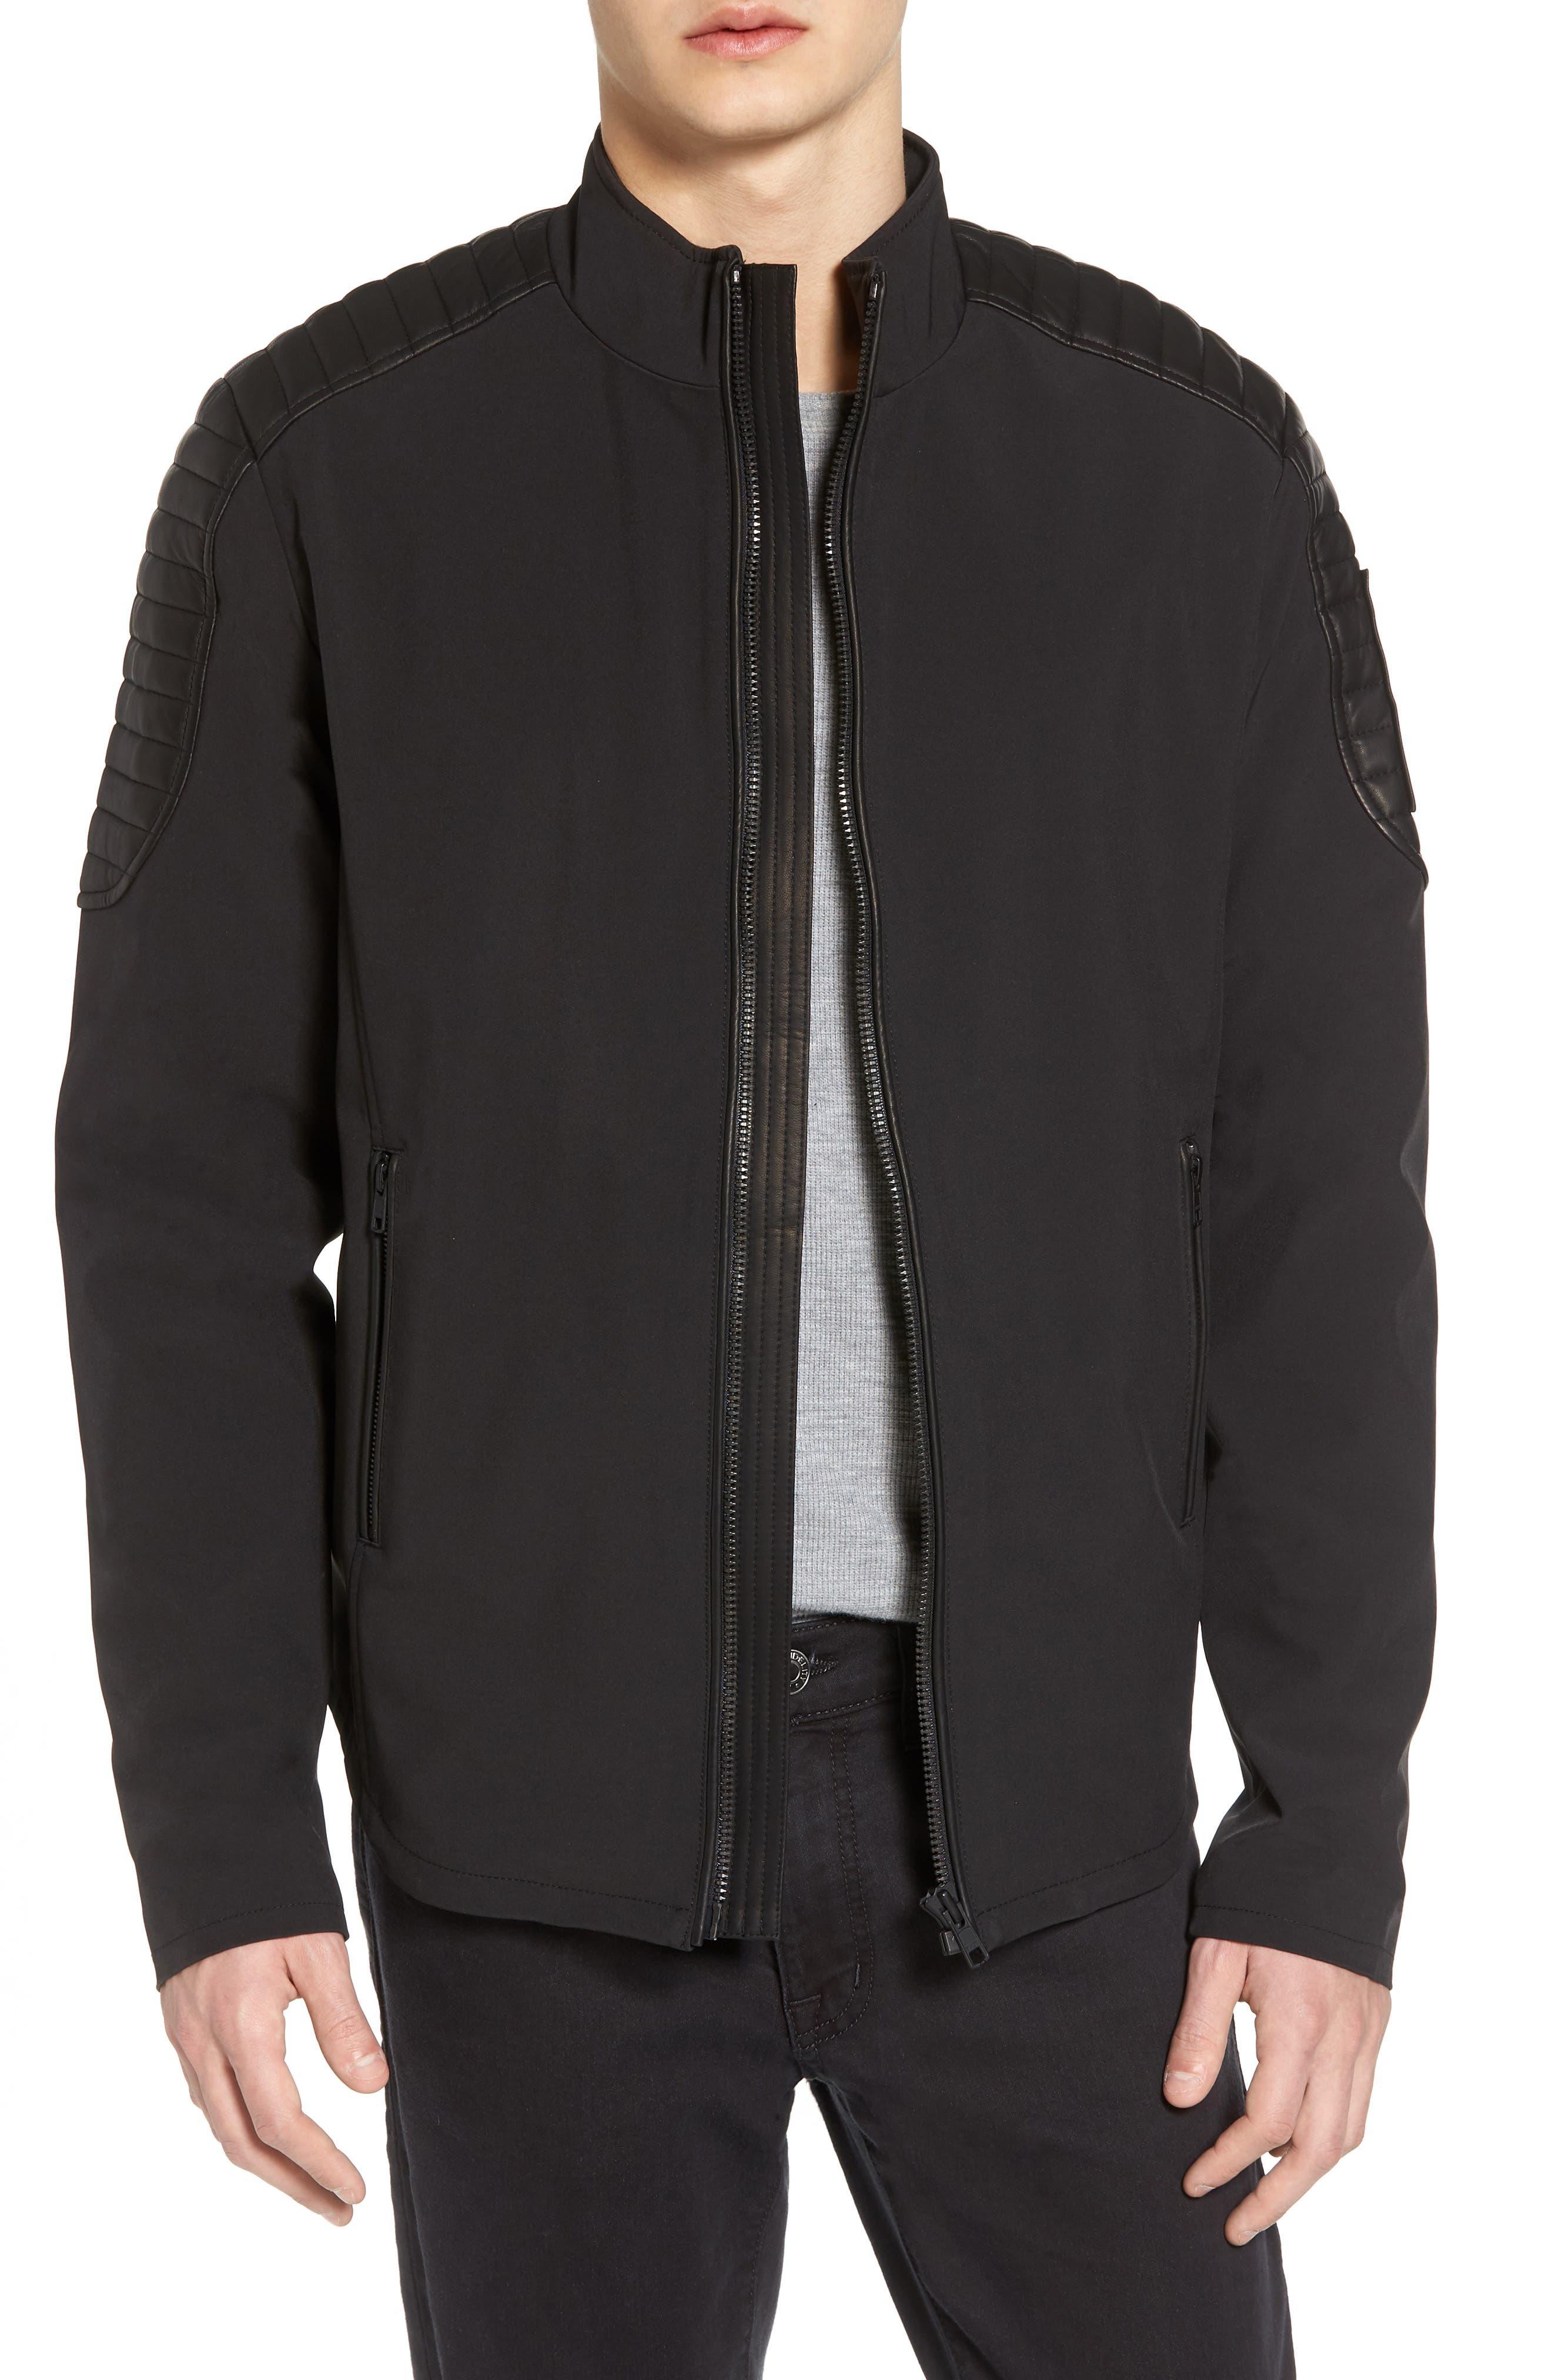 Grindstone Water Repellent Jacket,                         Main,                         color, Black